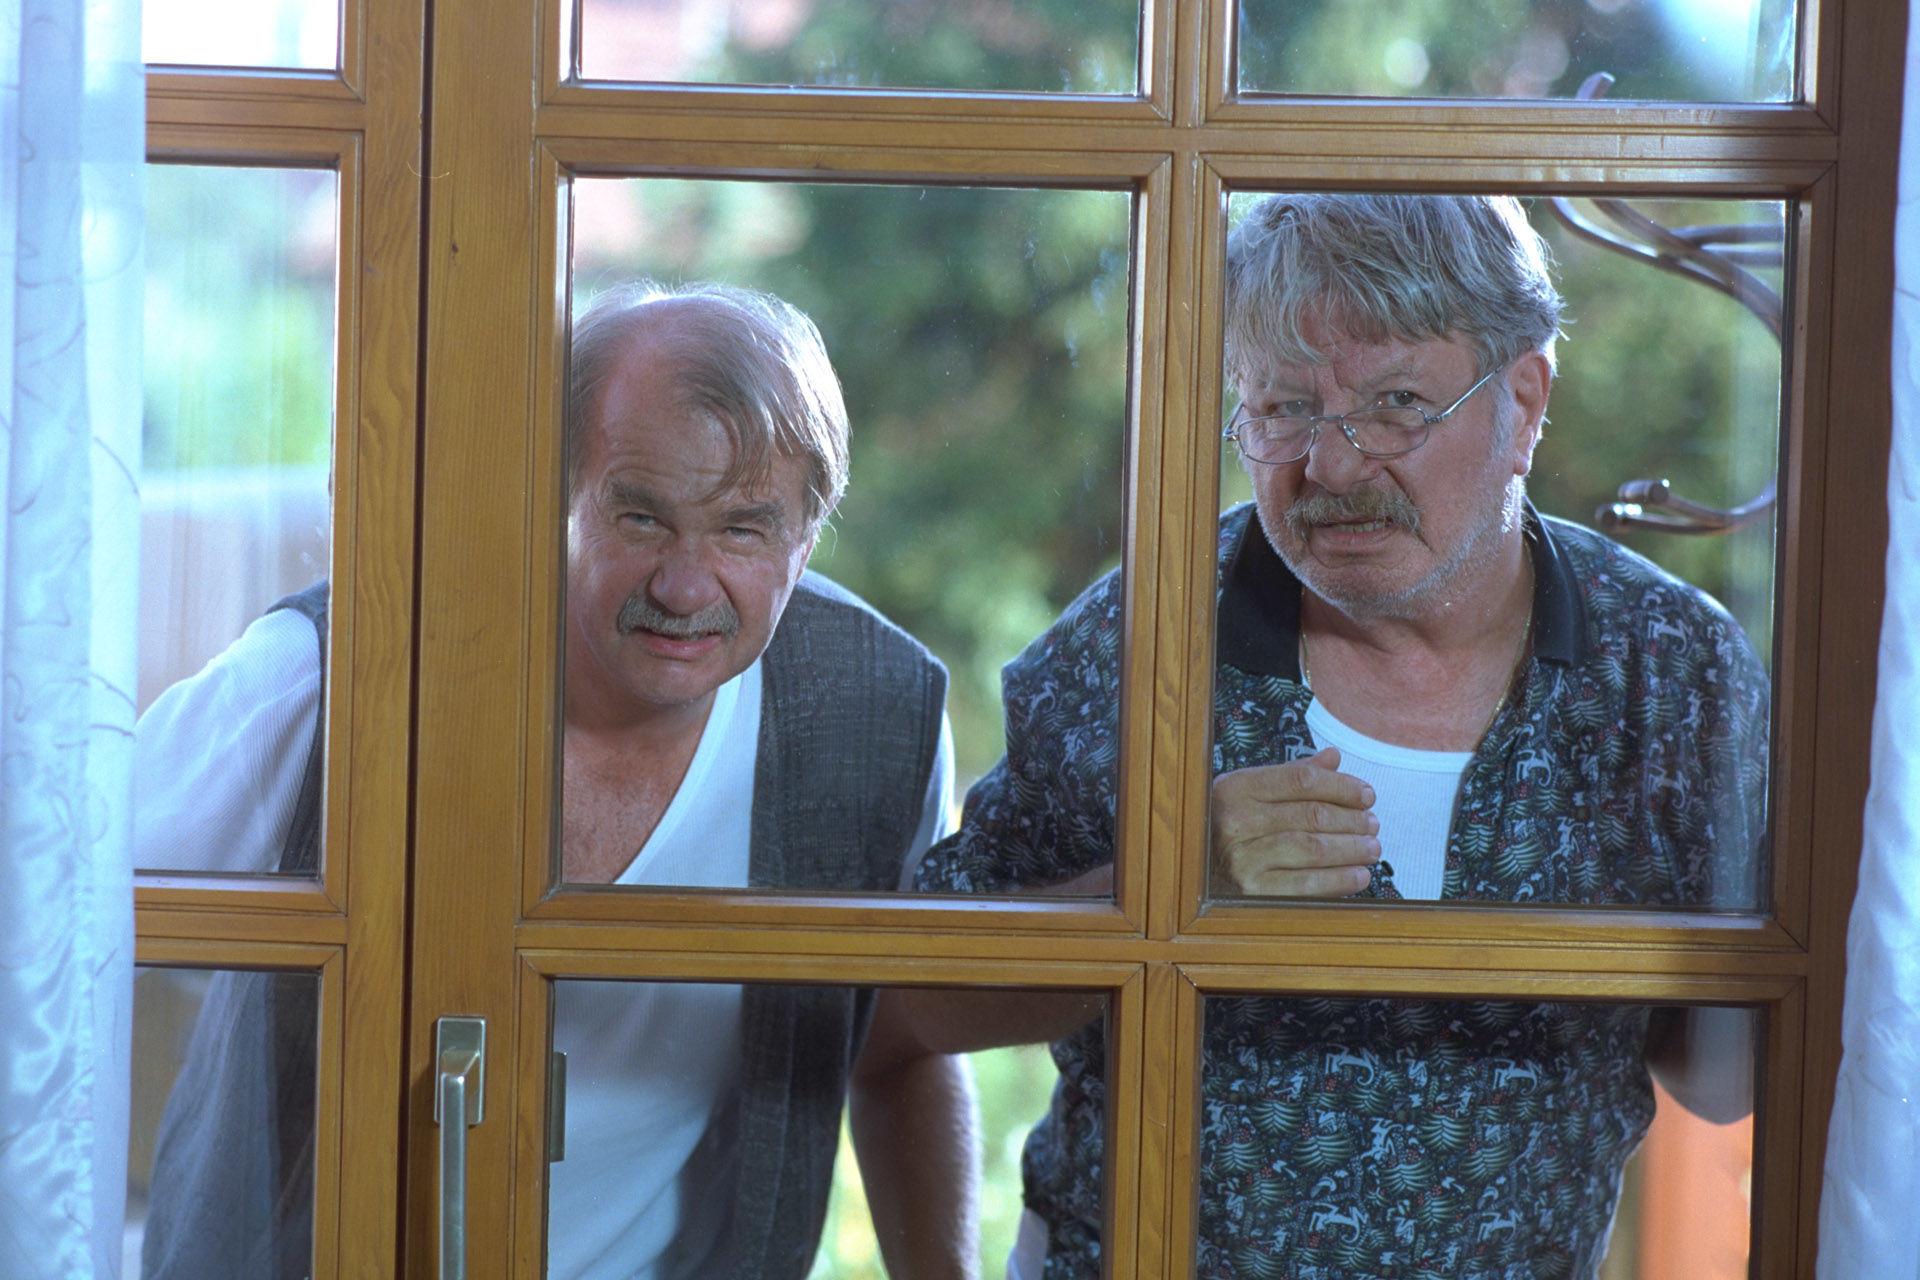 Ernst Konarek (Sigis Vater), Heinz Petters (Sigis Opa)